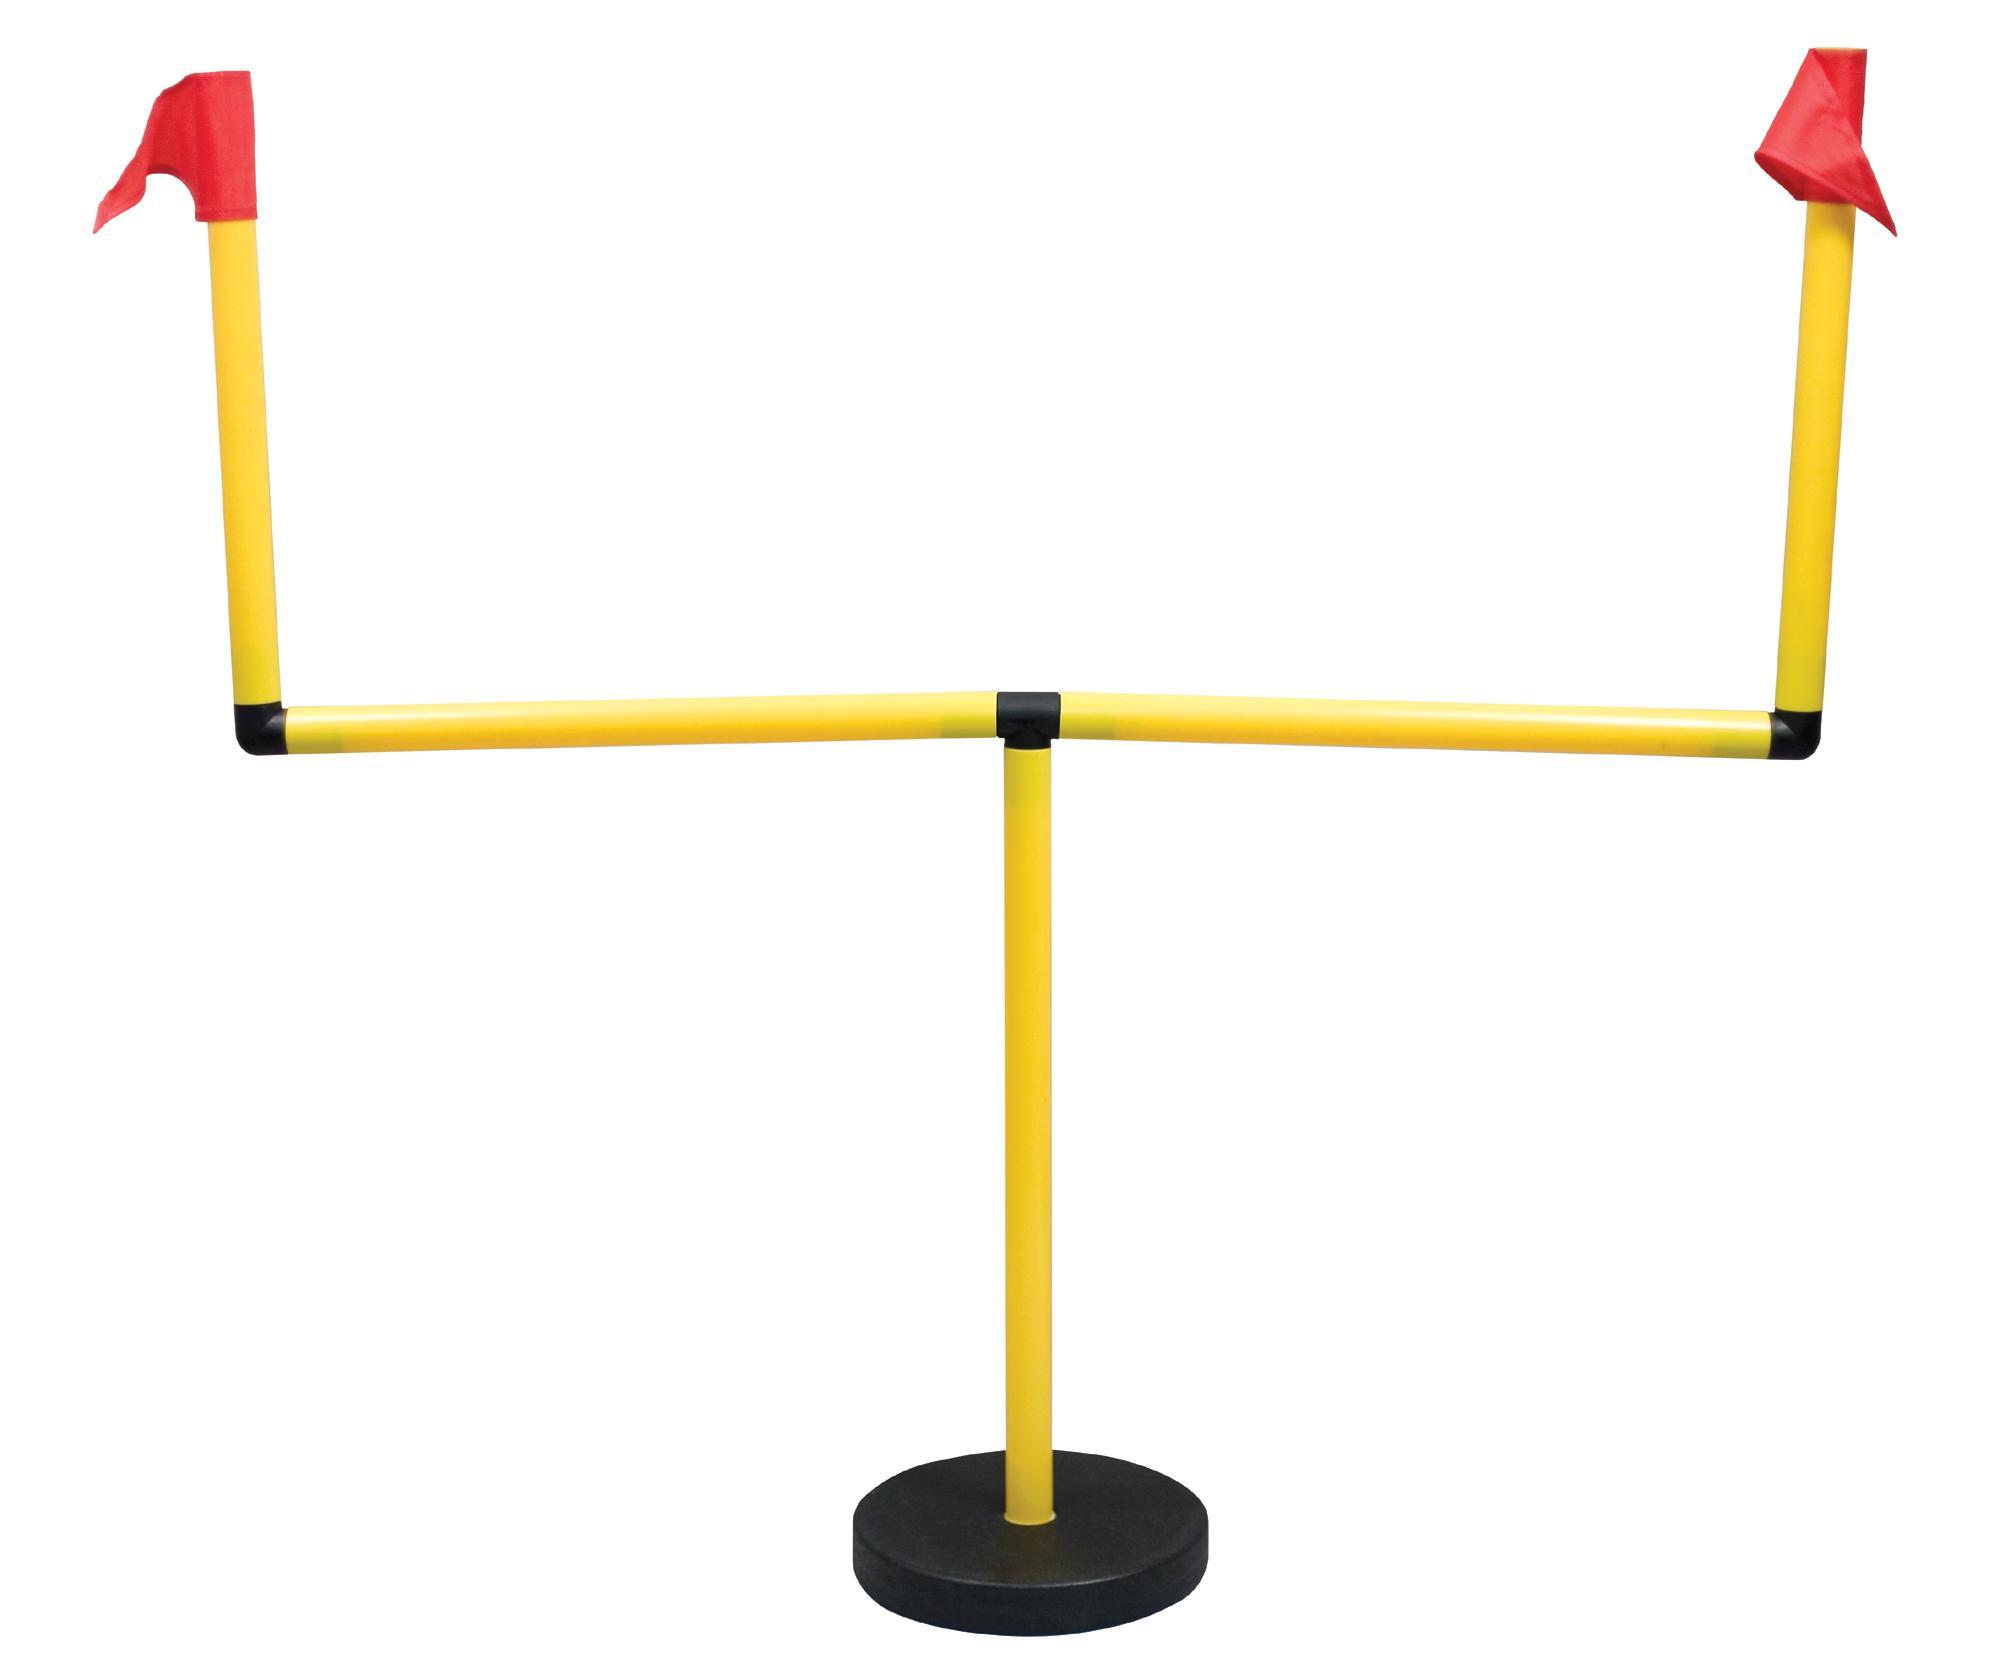 2000x1677 Field Goal Clipart